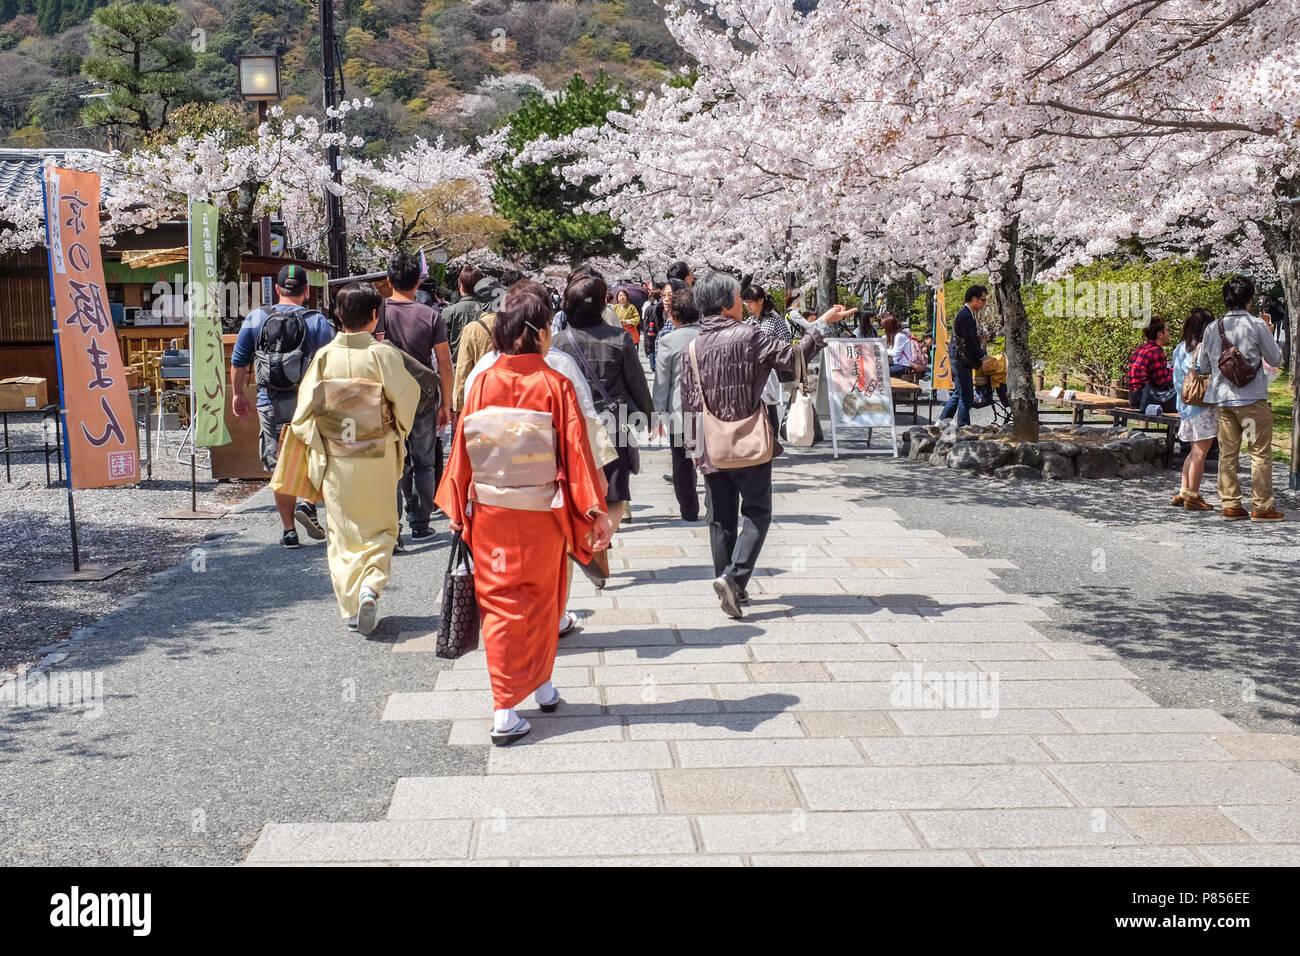 Japanese tourists explore Arashiyama in the outskirts of Kyoto, Japan. Arashiyama has been a popular destination during spring since the 8th century Stock Photo